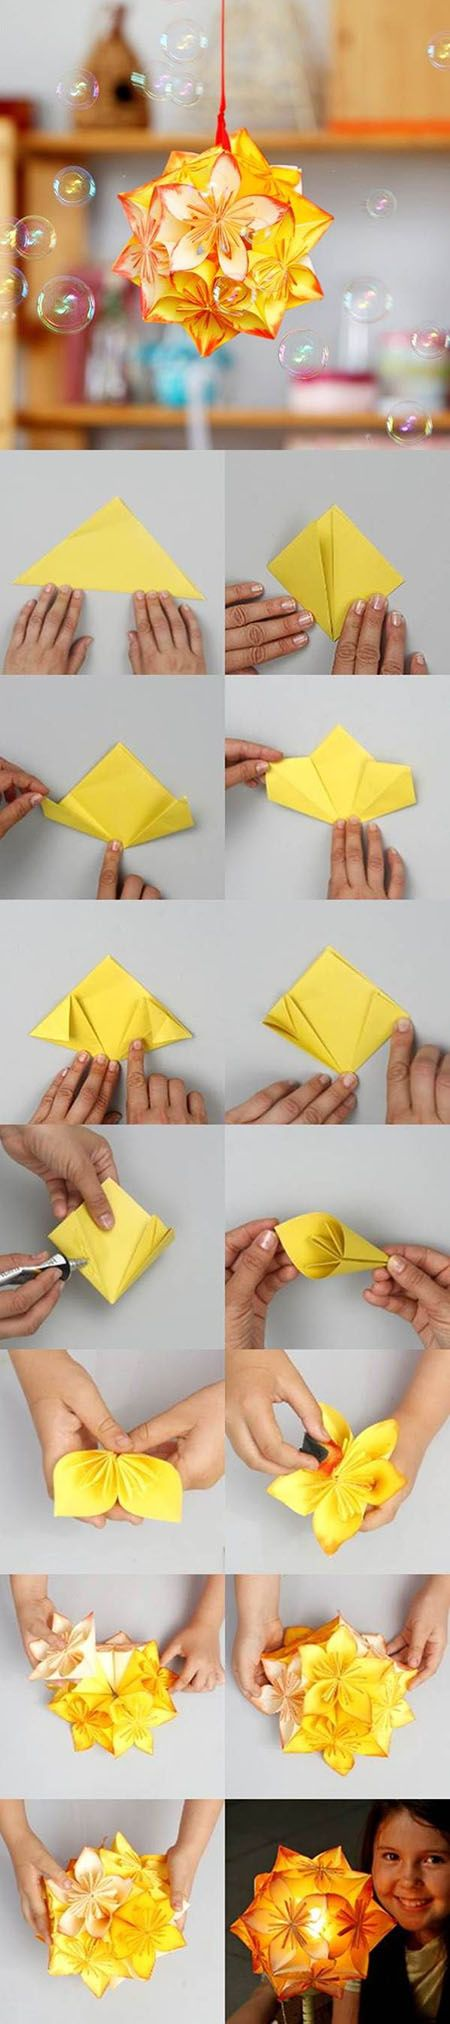 DIY Origami Kusudama Decoration | DIY & Crafts Tutorials